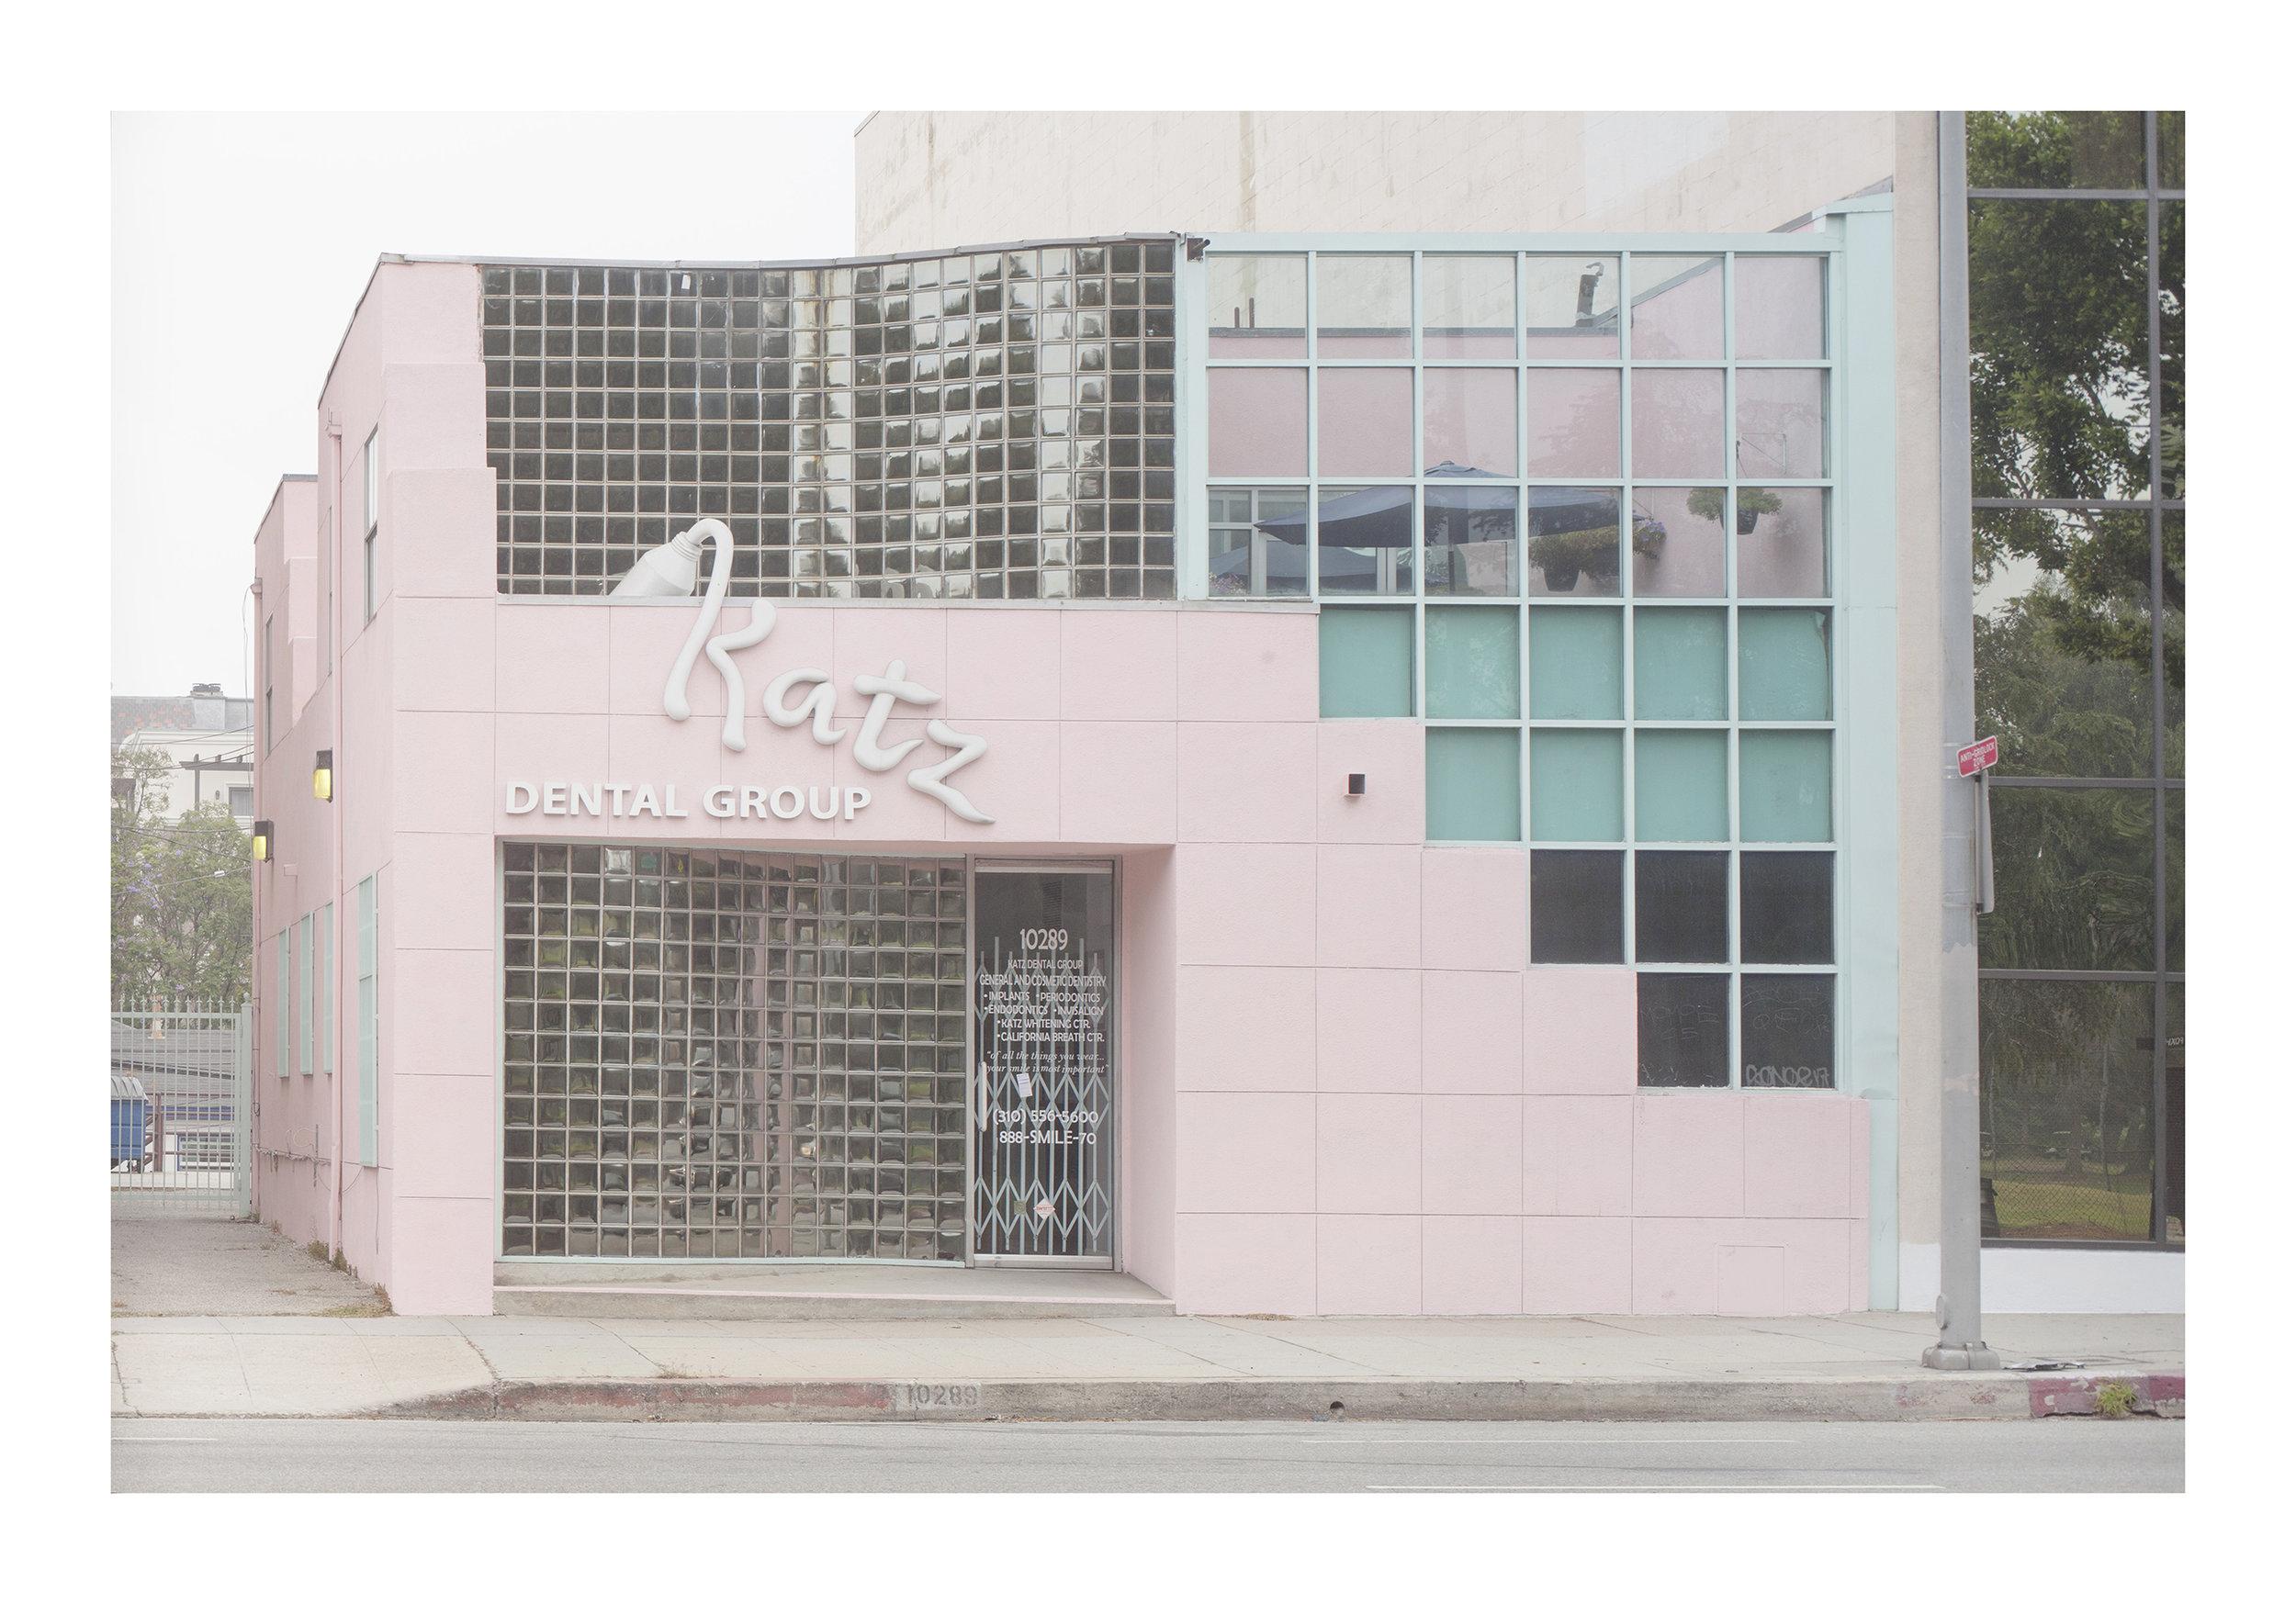 Katz Dental Los Angeles, California 2017